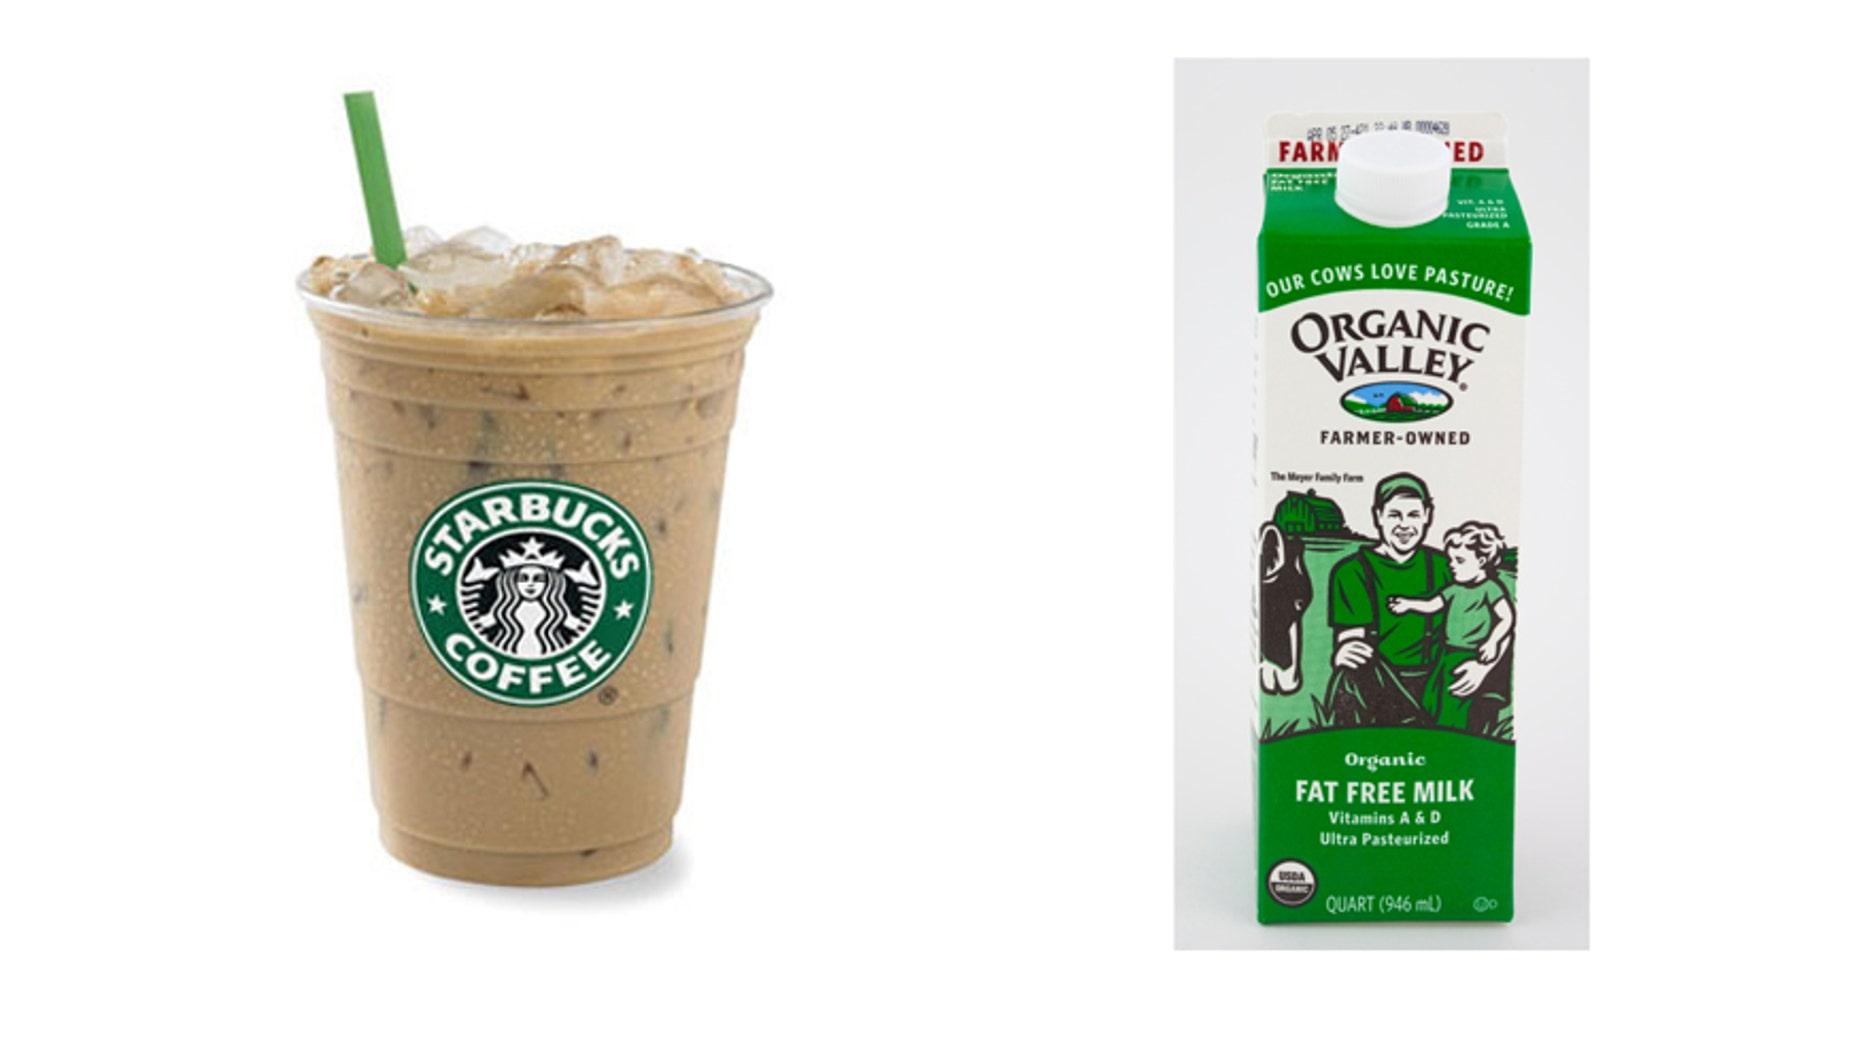 Will Starbucks offer organic milk next?